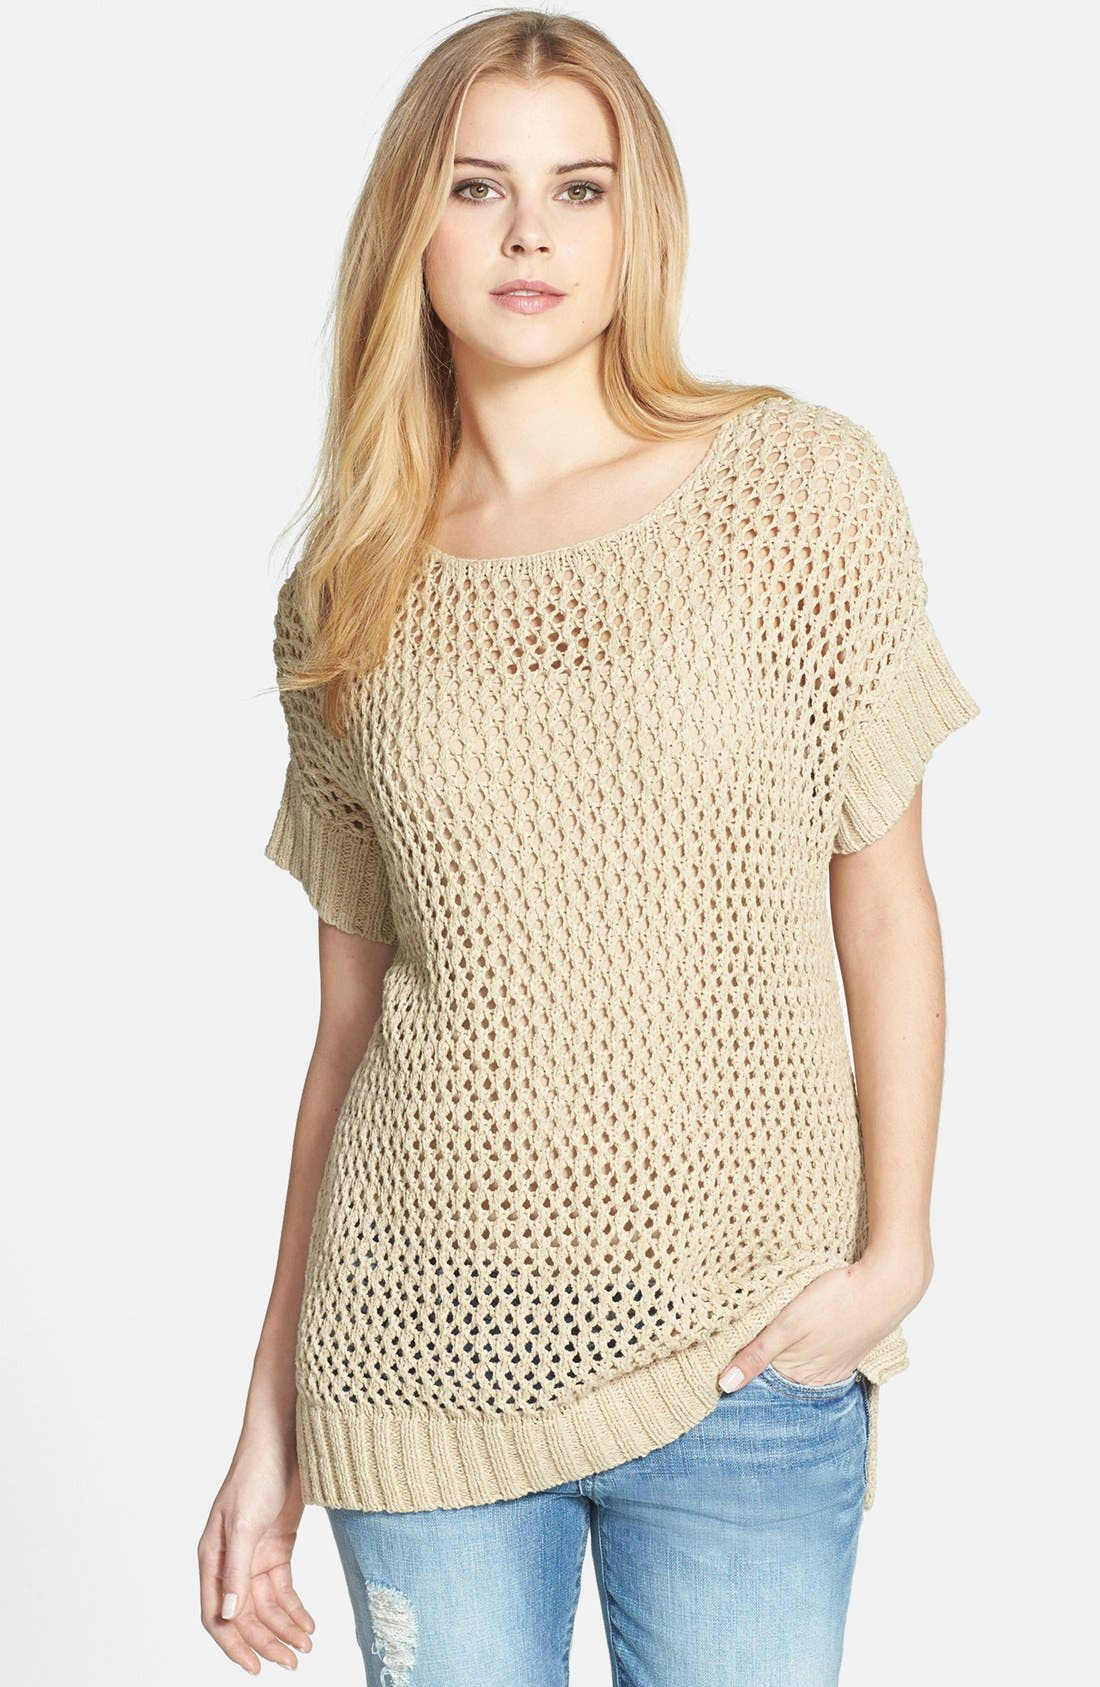 Main Image - Vince Camuto Open Stitch Cotton Blend Sweater